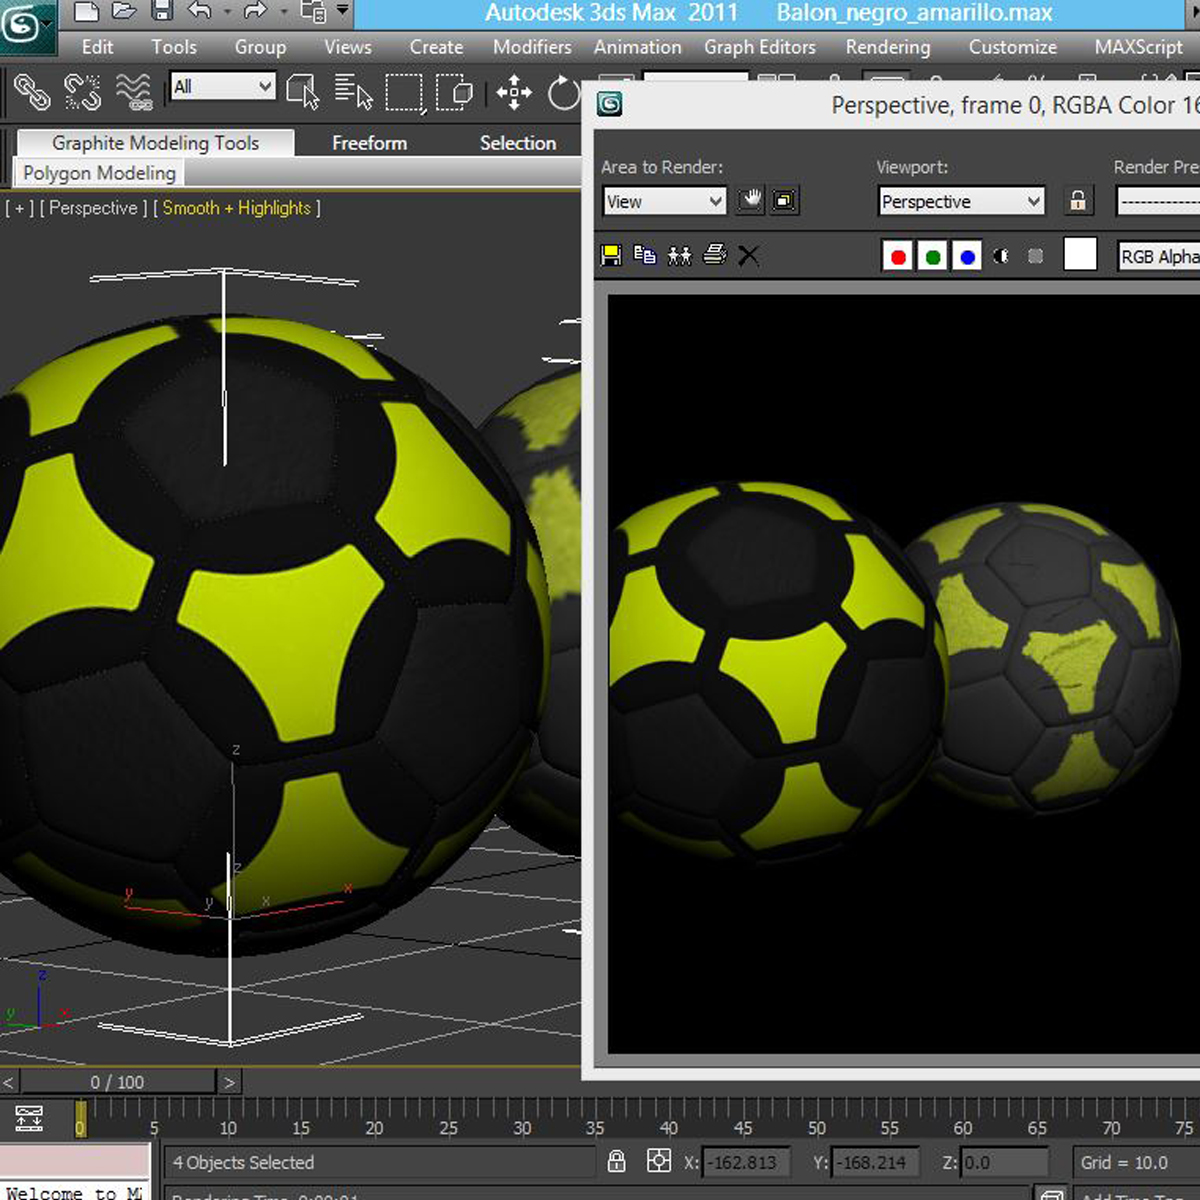 soccerball black yellow 3d model 3ds max fbx c4d ma mb obj 204216